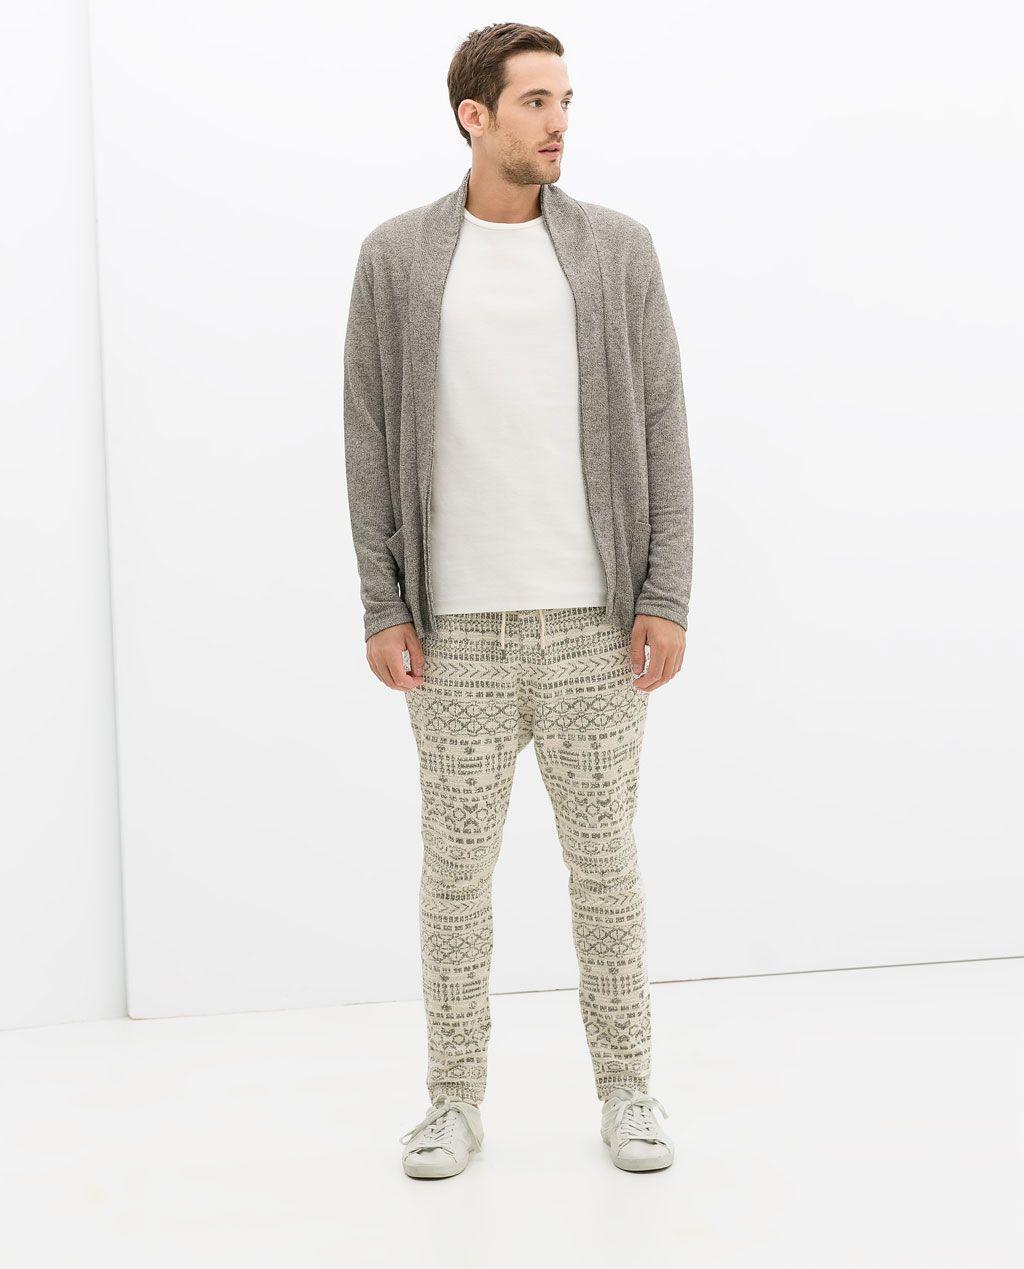 Zara flannel shirt mens  ZARA  KOLLEKTION AW  JACQUARDHOSE MIT ETHNOMUSTER  Menswear